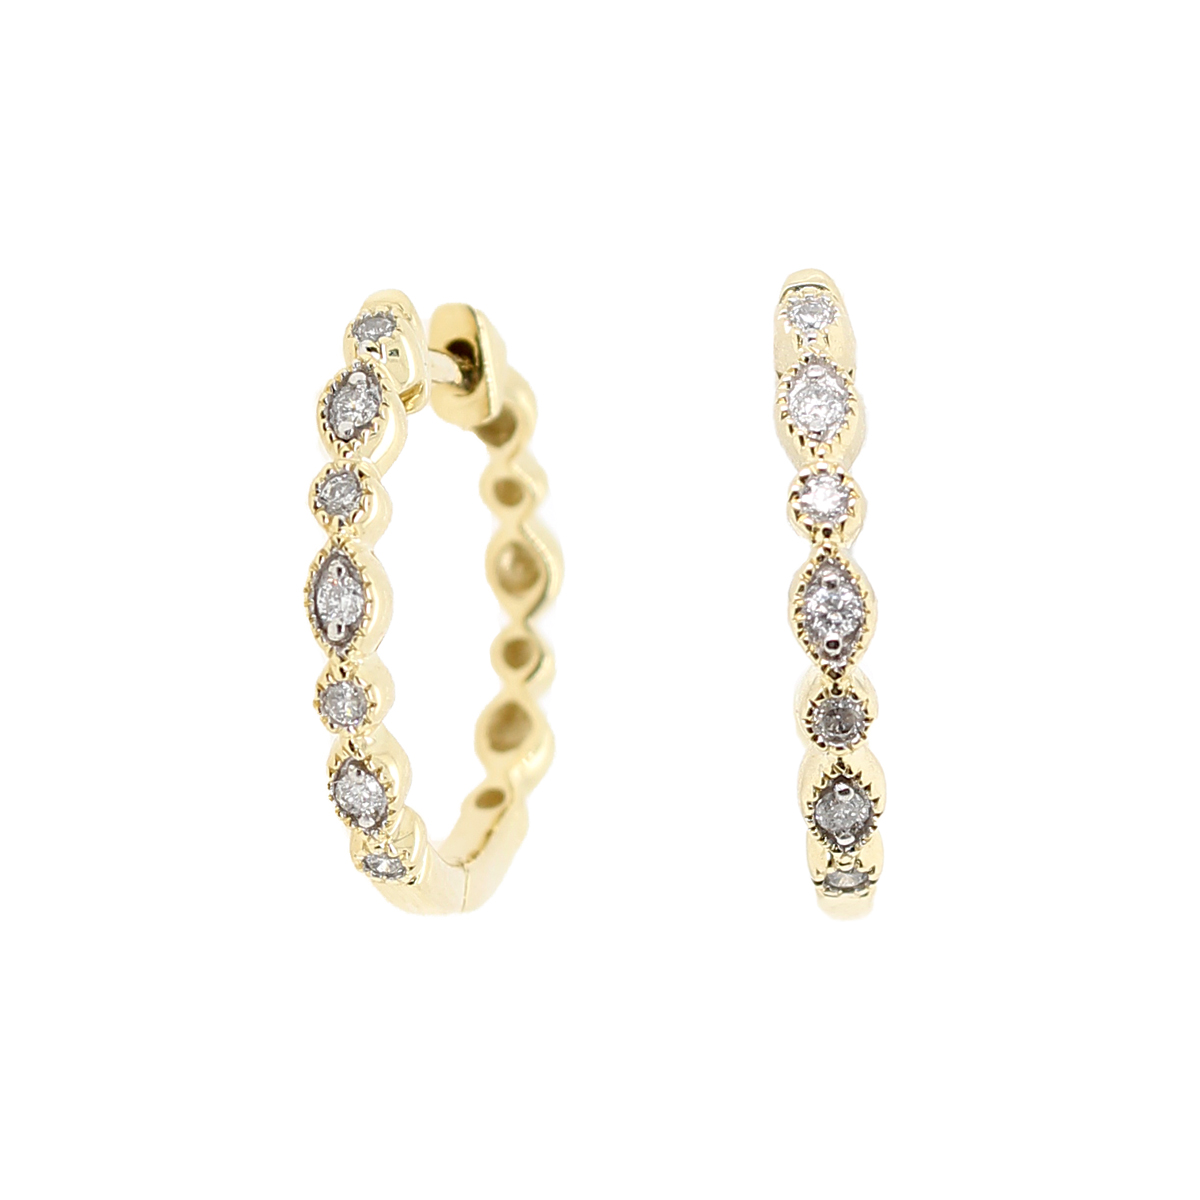 10 Karat Yellow Gold Marquise Diamond Hoop Earrings